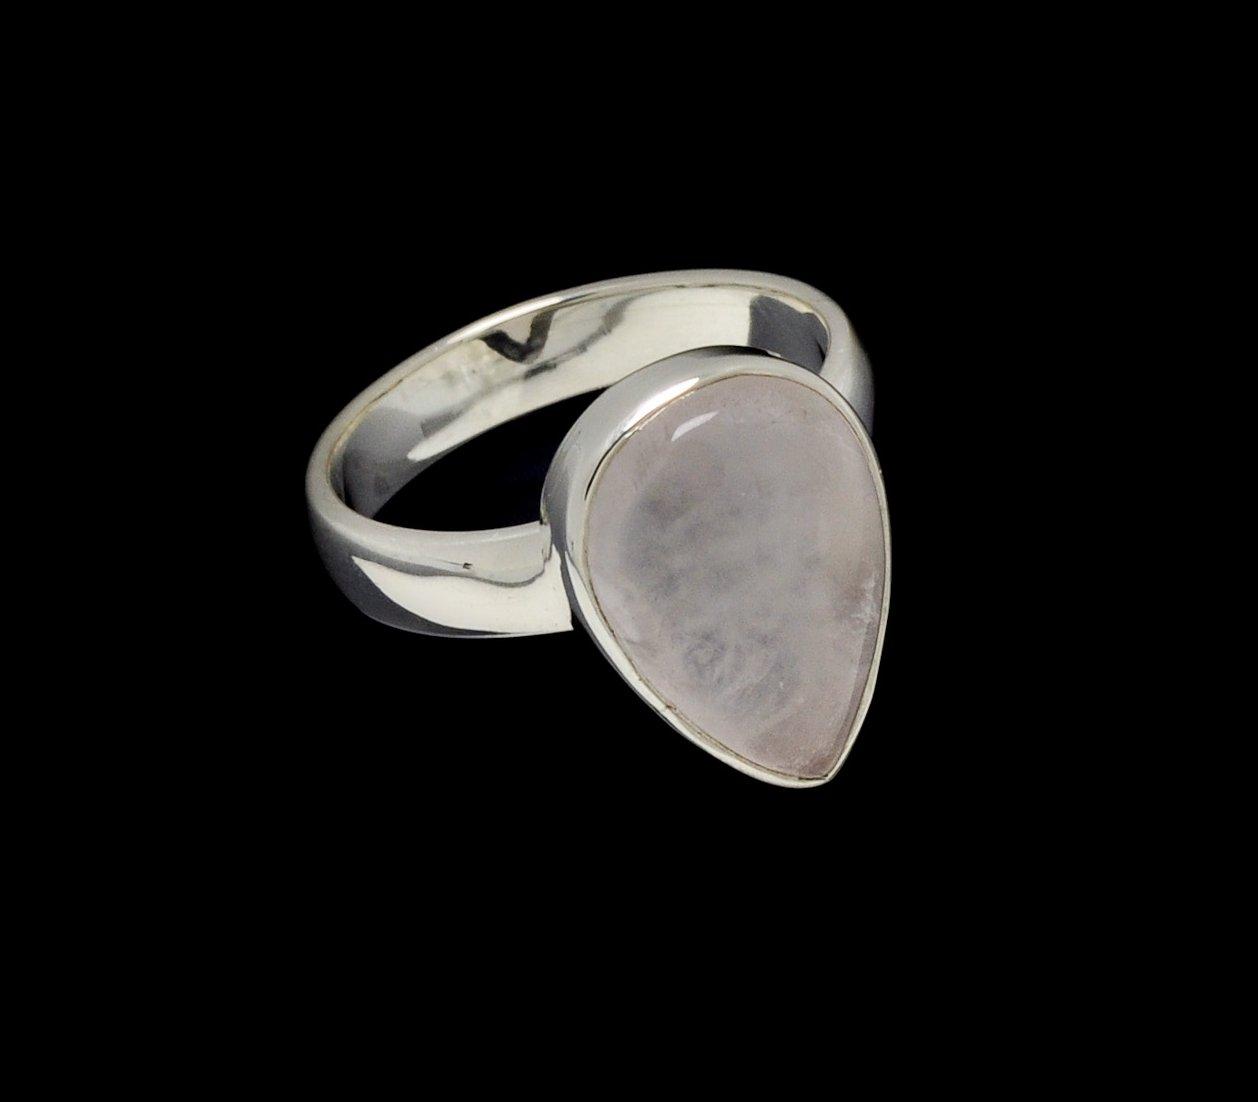 Rose Quartz Ring 15mm x 10mm Pear Cut